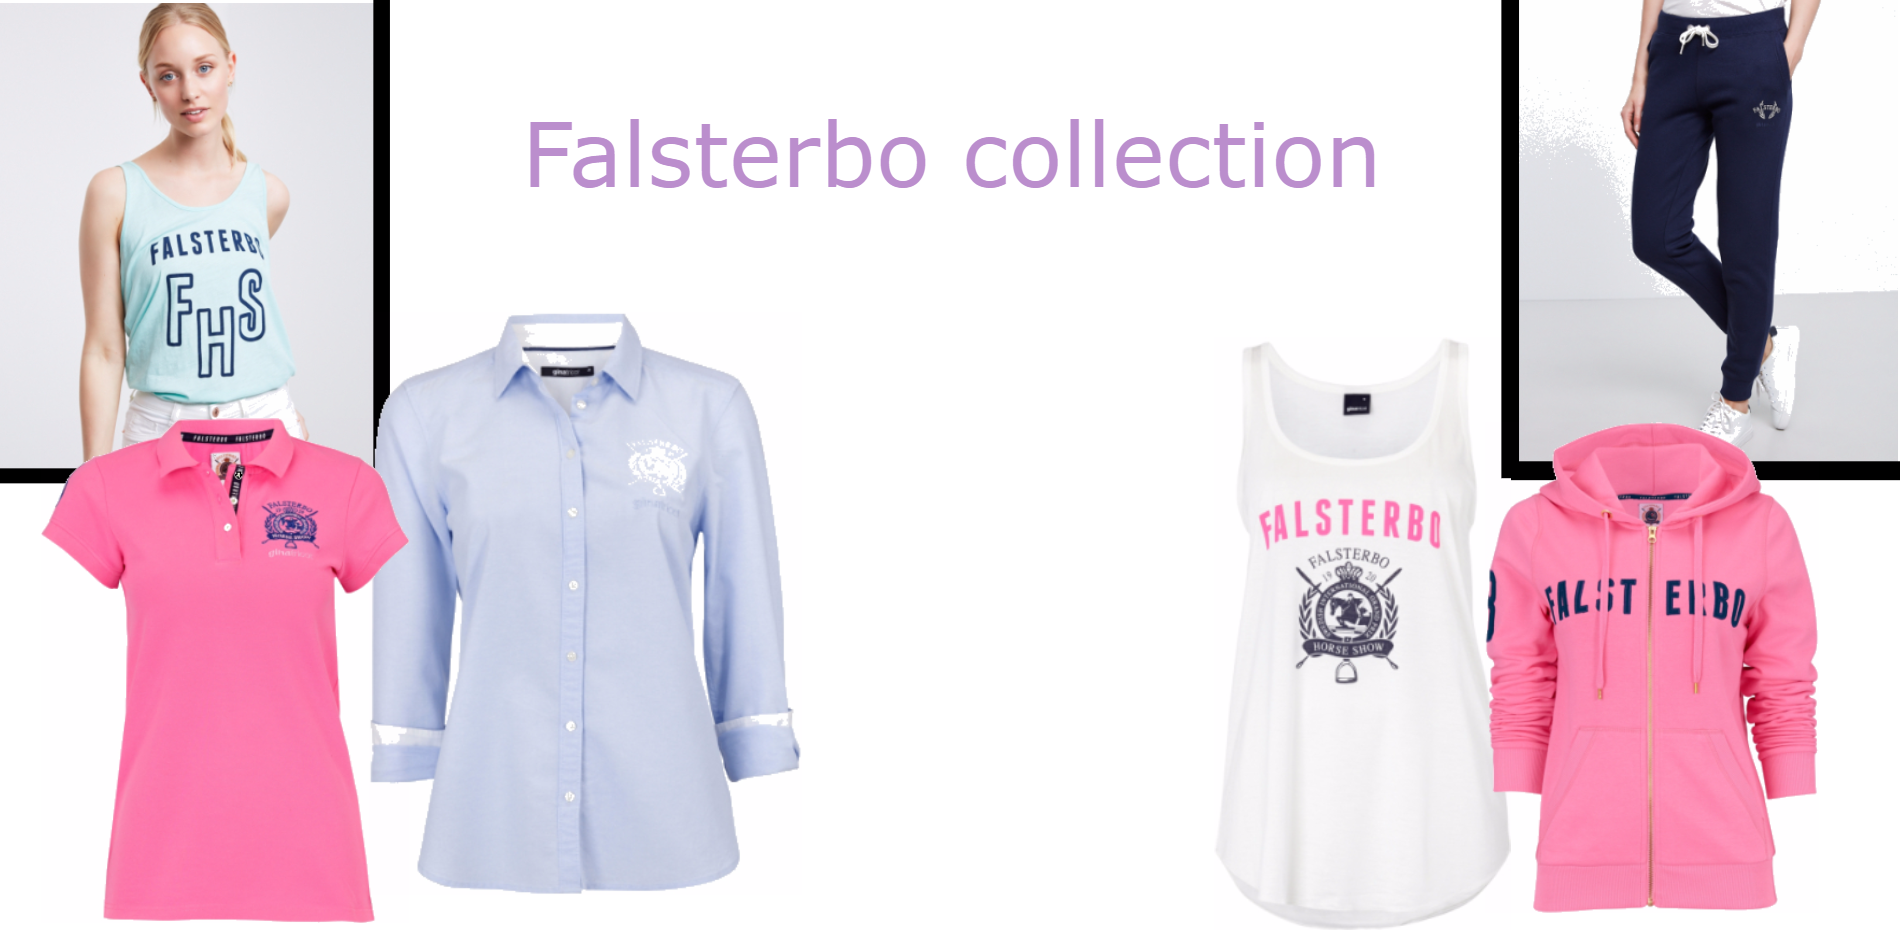 Falsterbo Collektion